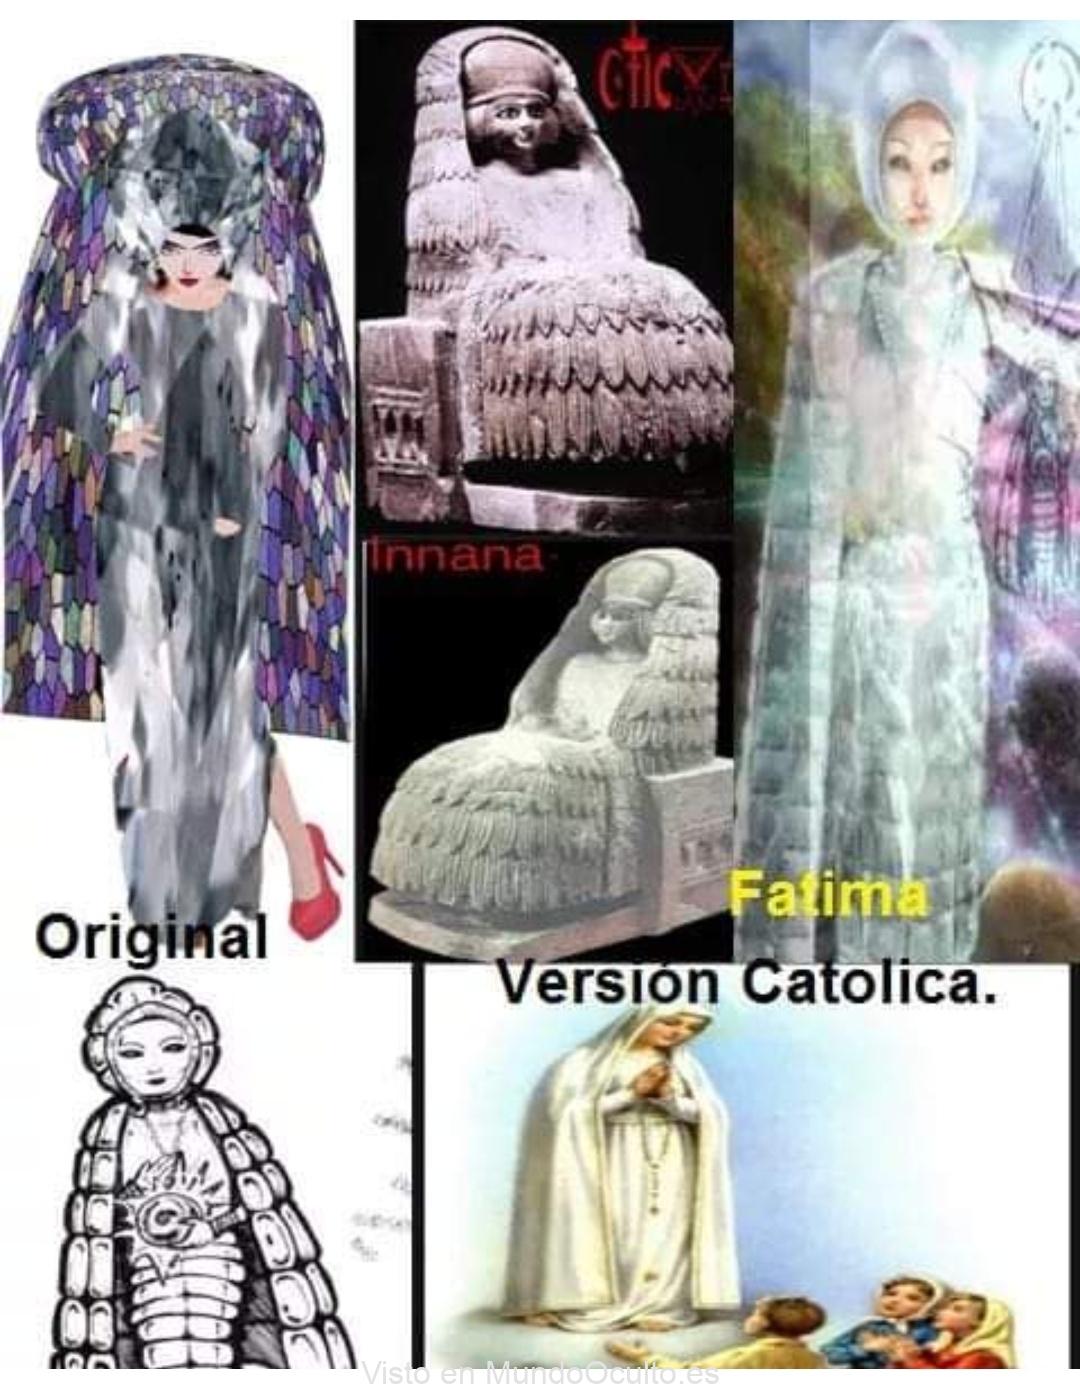 La Virgen De Fatima Es La Annunaki Innana.